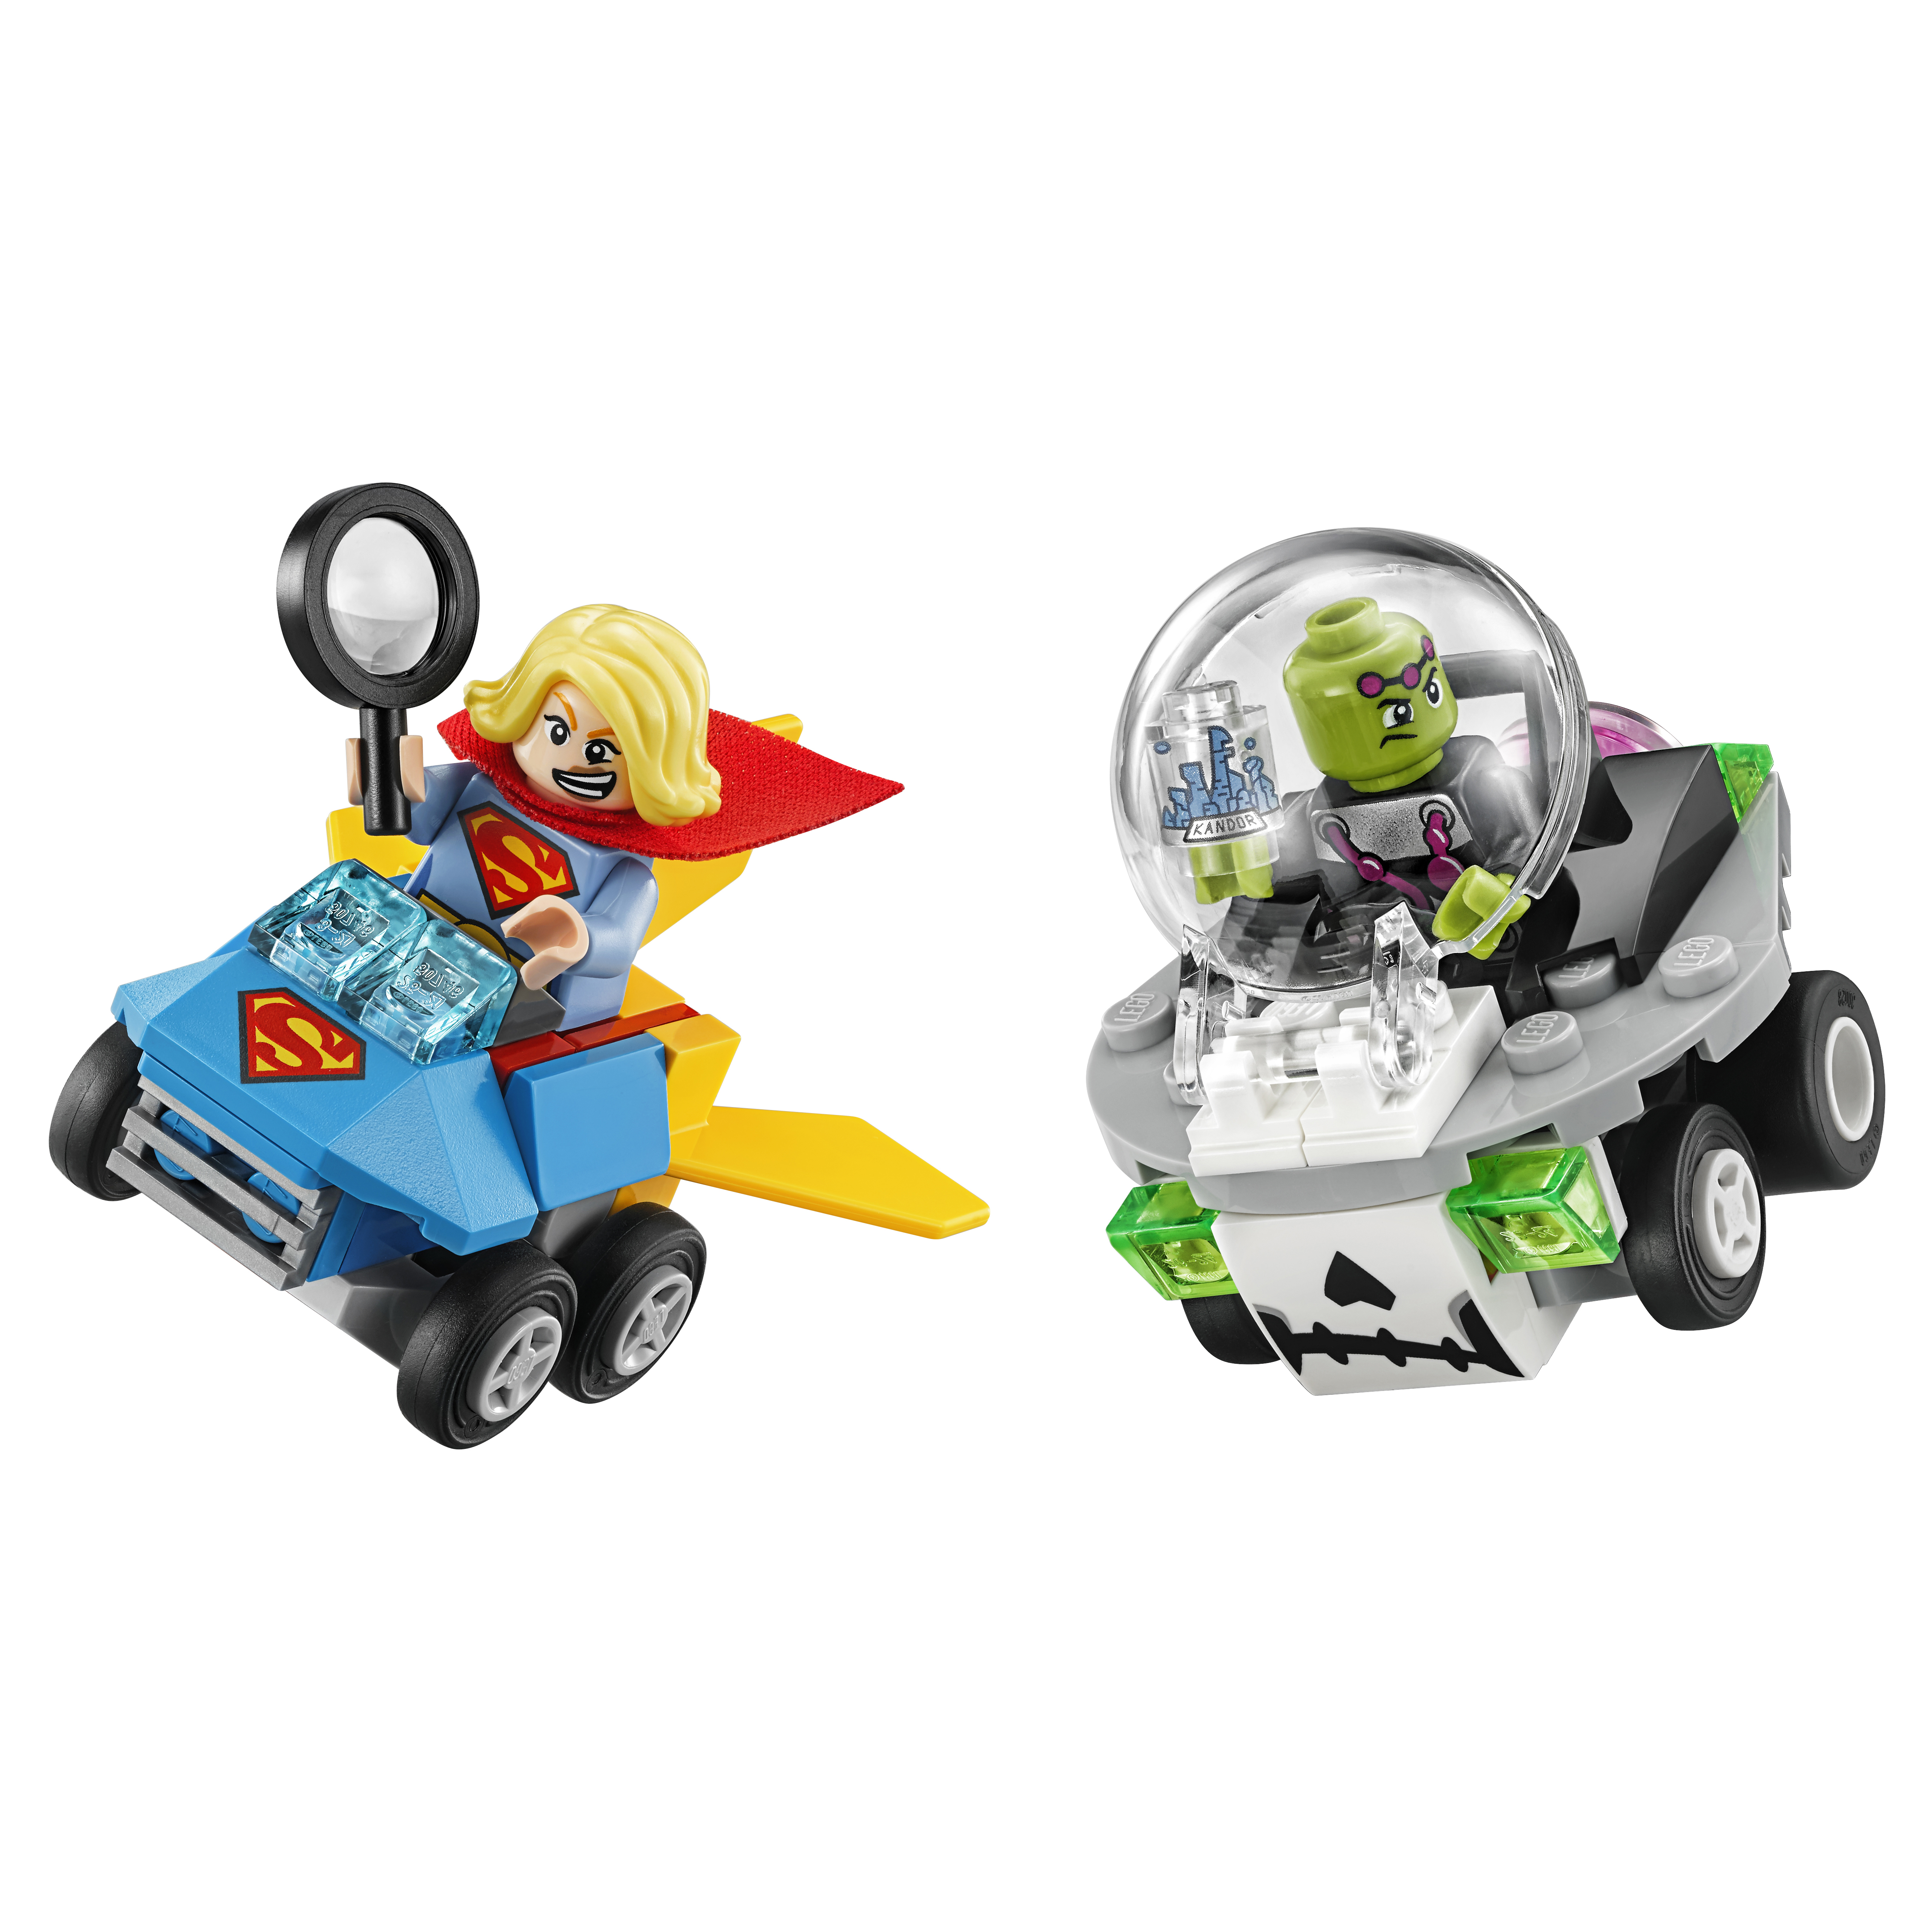 Купить Конструктор lego super heroes mighty micros супергёрл против брейниака (76094), Конструктор LEGO Super Heroes Mighty Micros Супергёрл против Брейниака (76094)